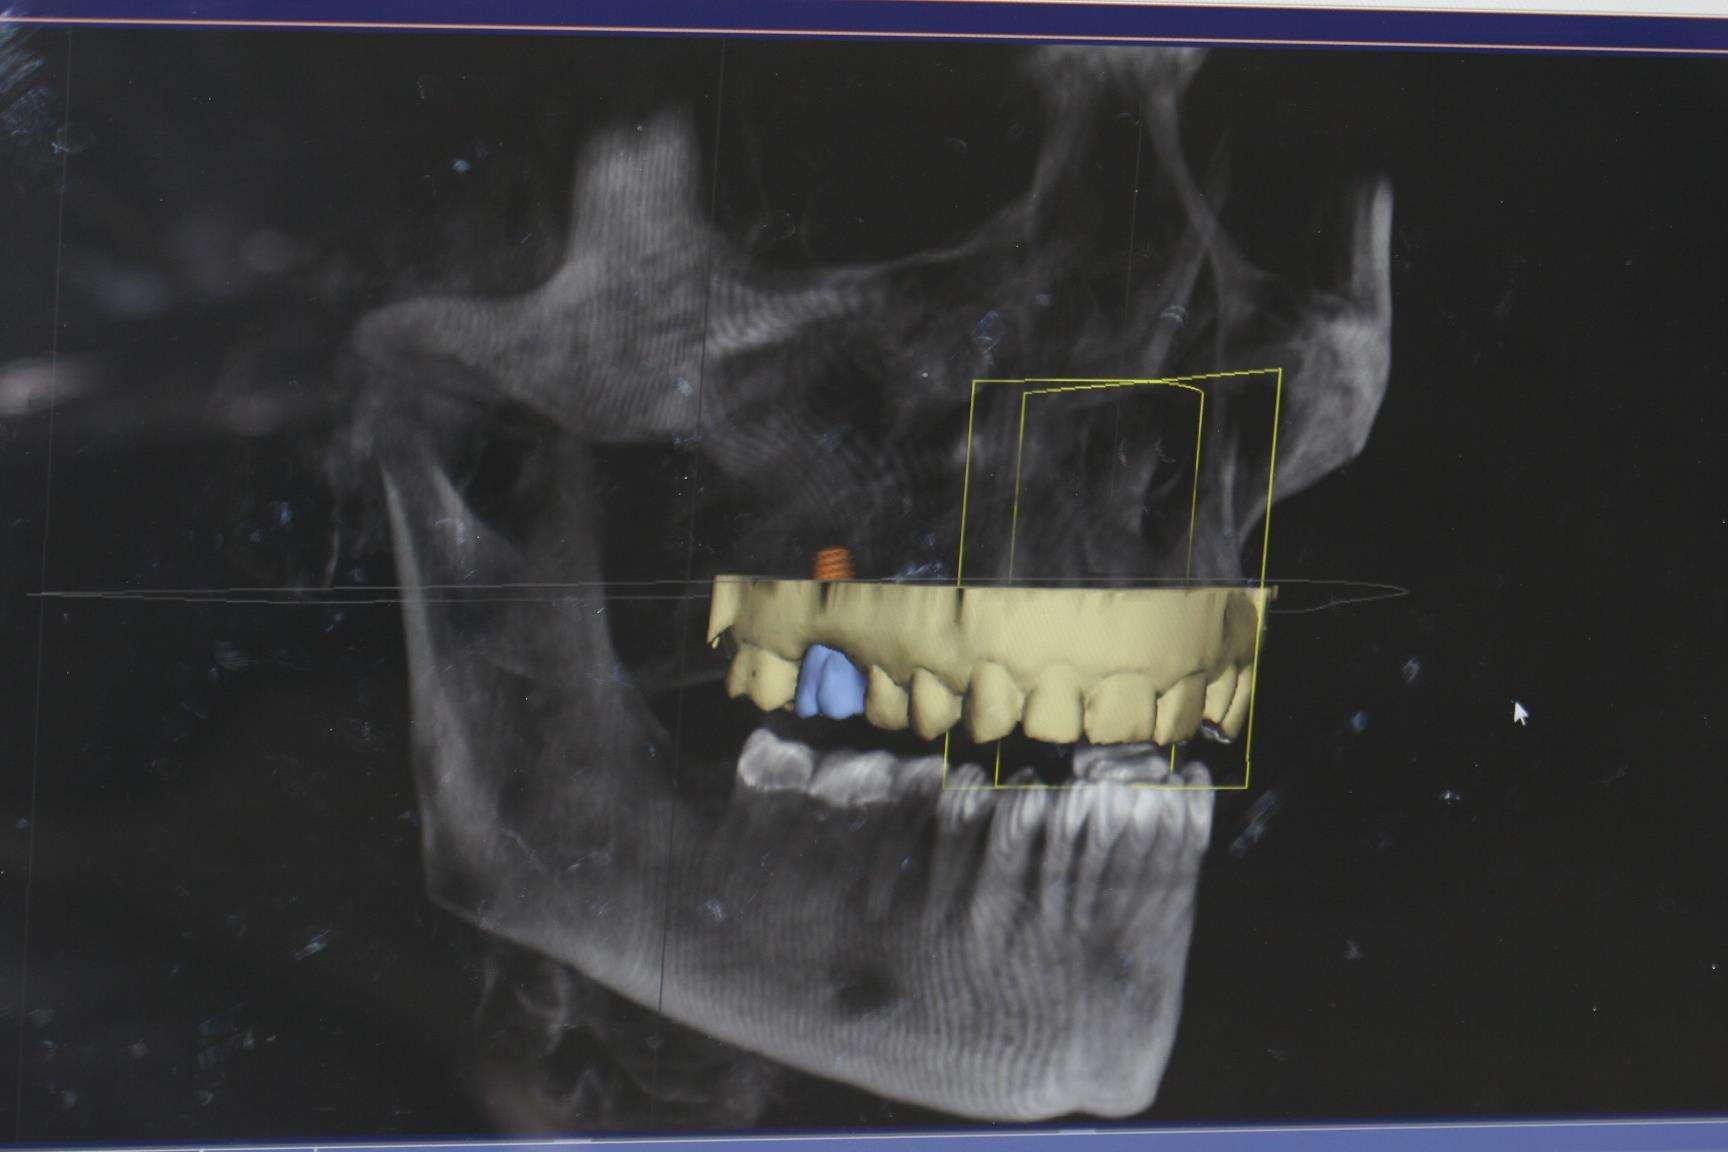 Dental Implant Technology